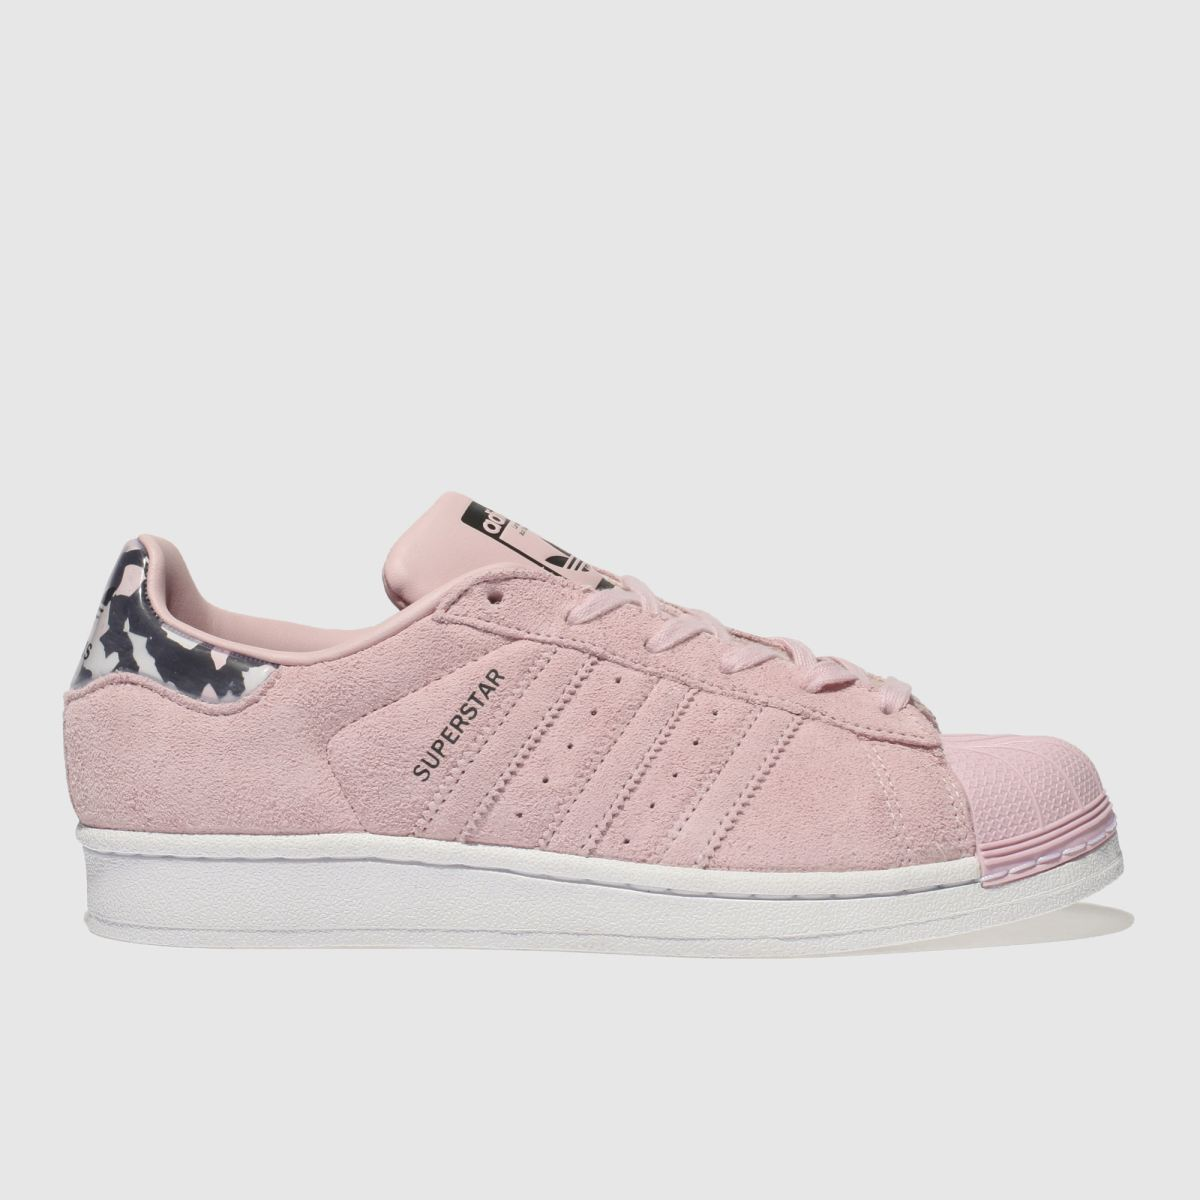 Adidas Pink Adi Superstar Girls Youth Youth